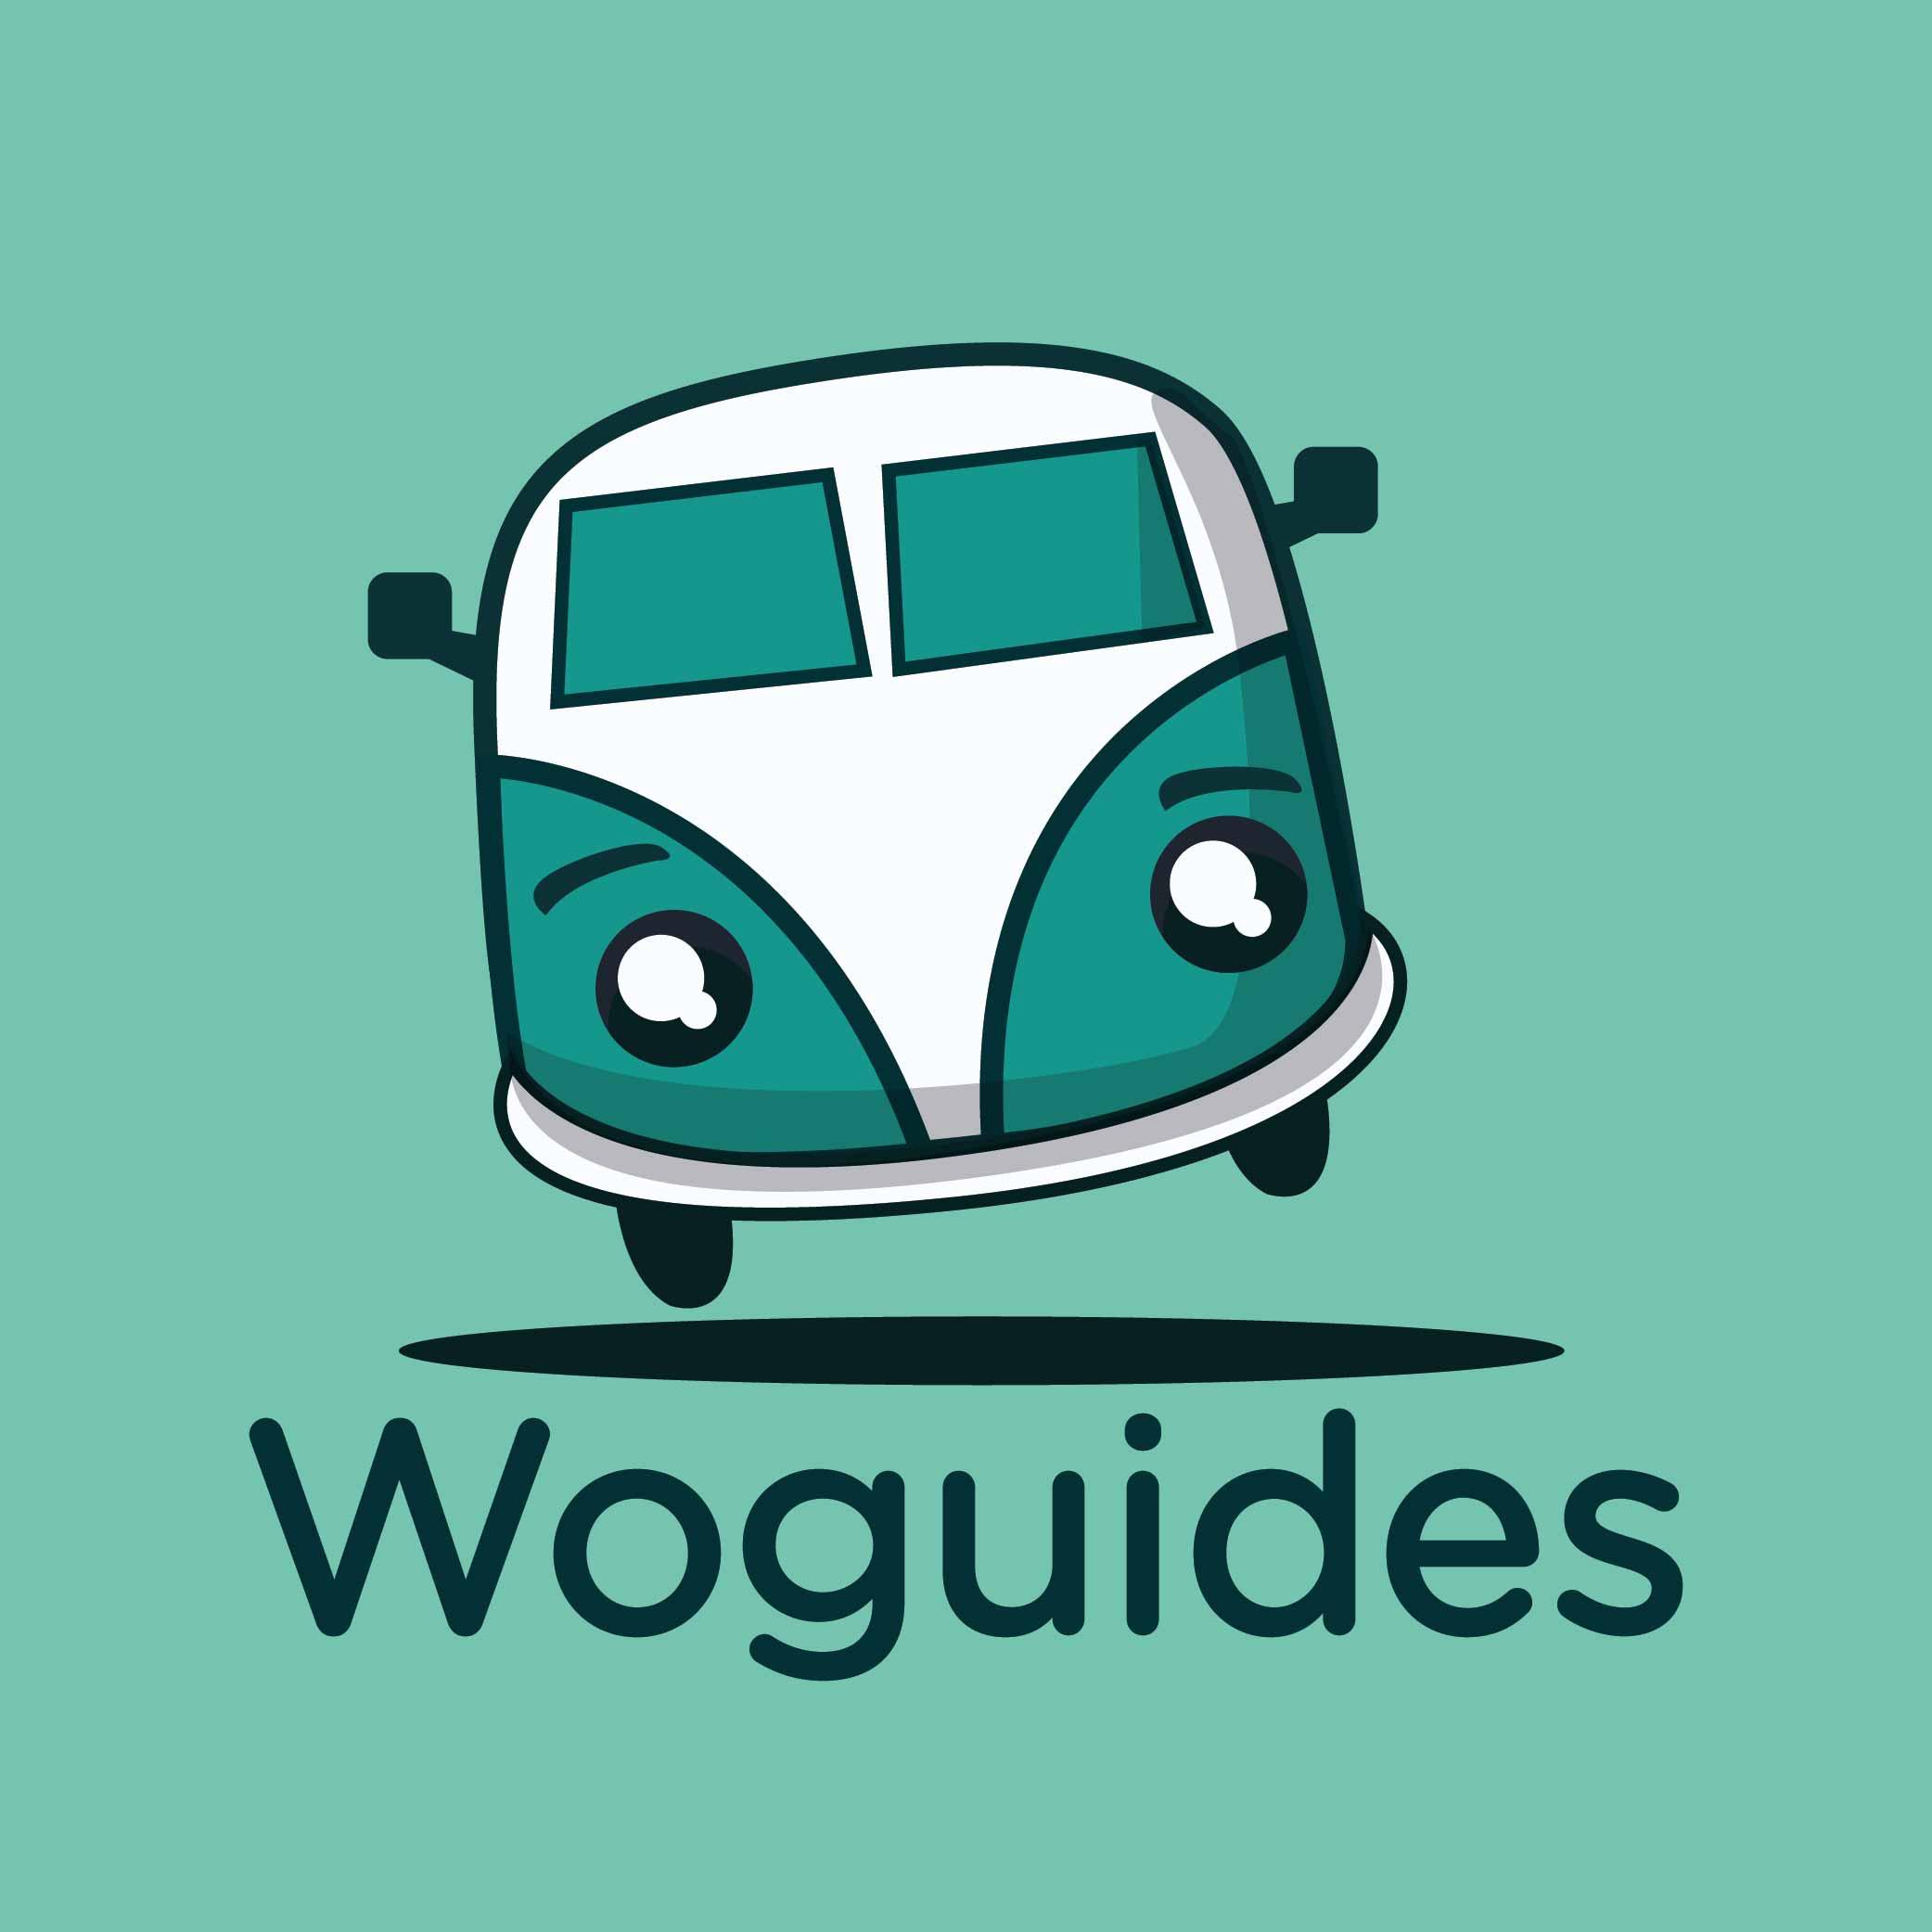 van-rental-malaysia-woguides-logo